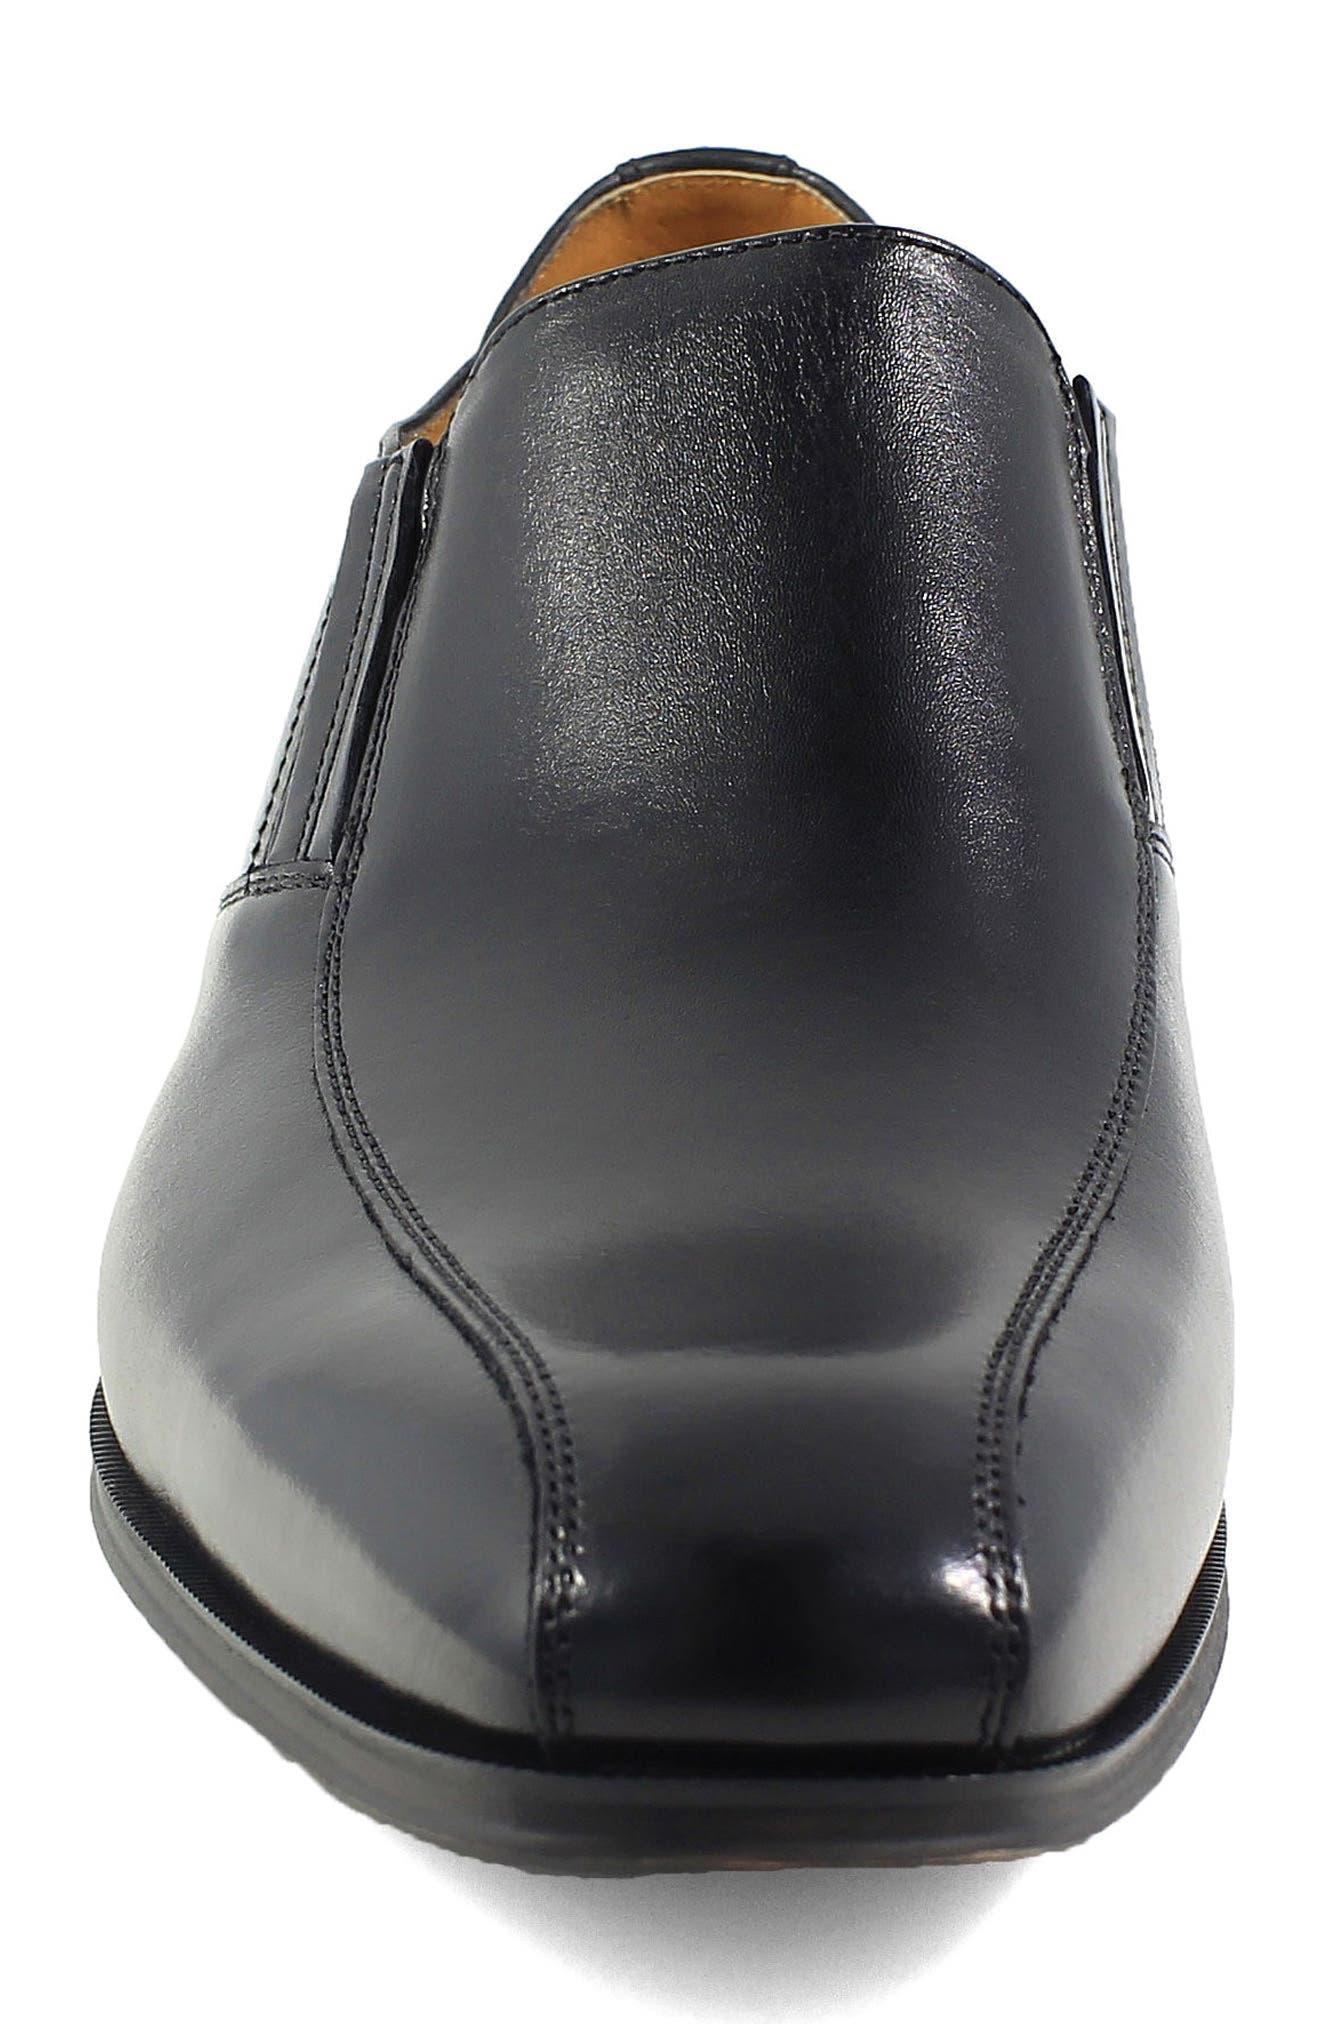 FLORSHEIM, Corbetta Venetian Loafer, Alternate thumbnail 4, color, BLACK